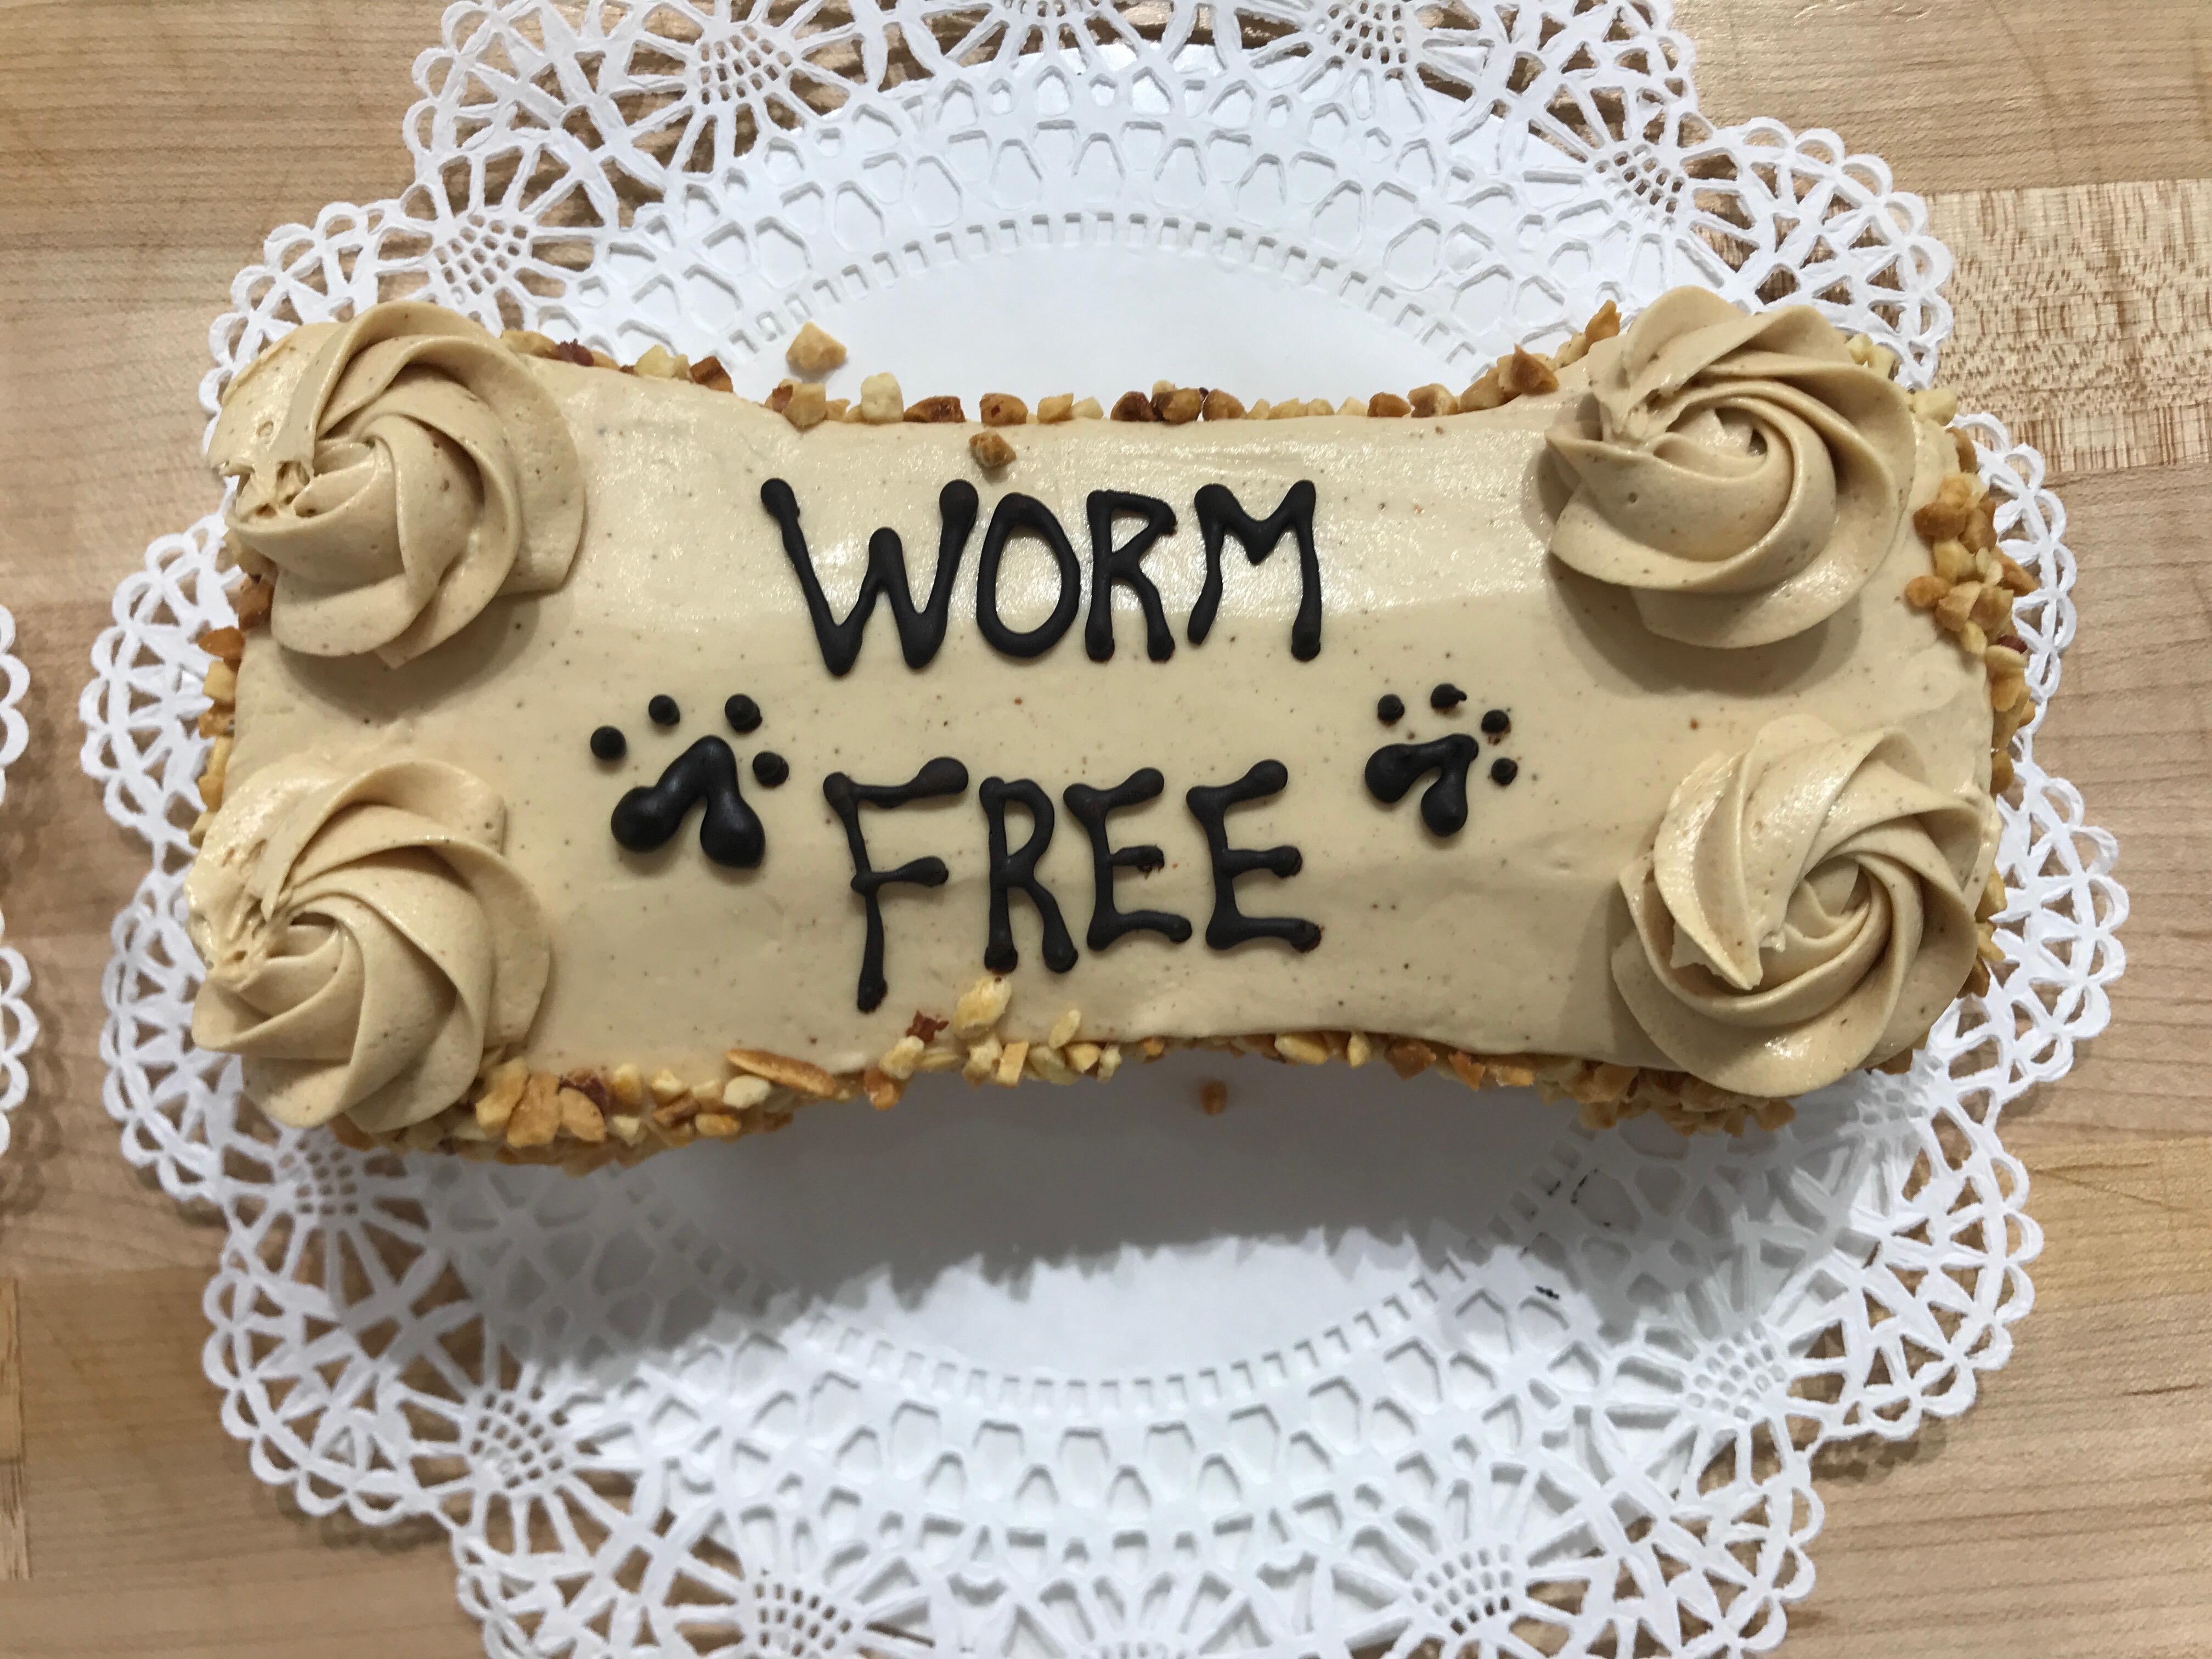 Worm Free